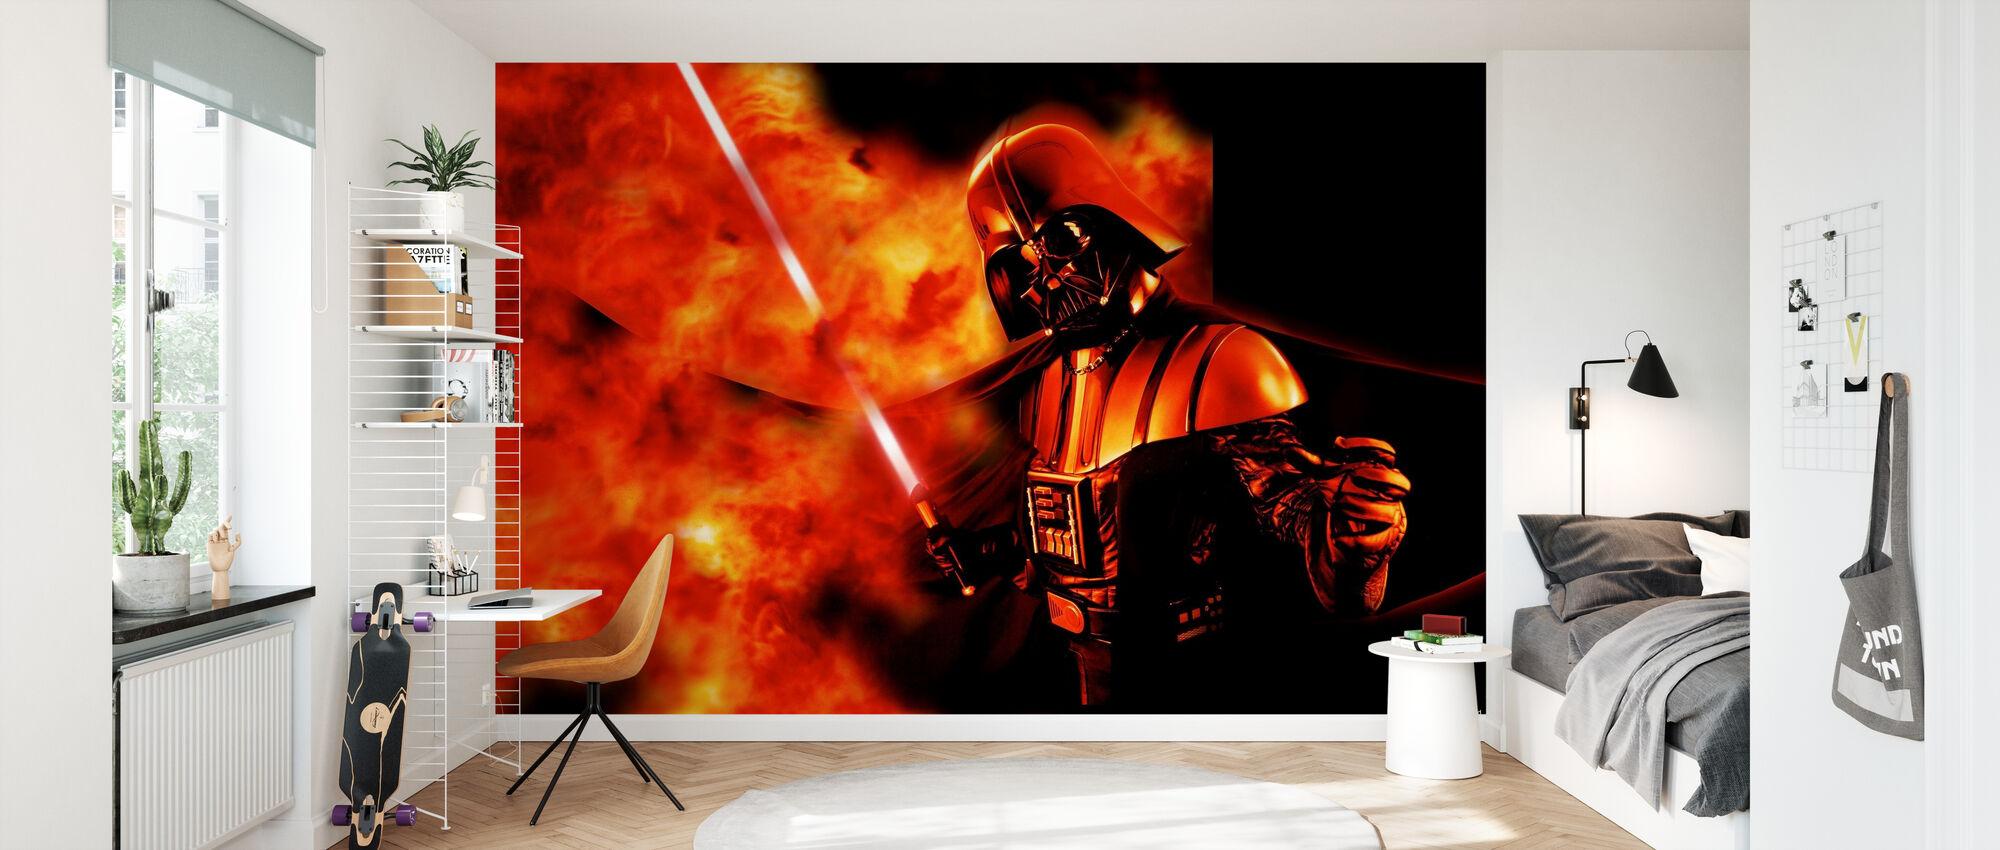 Tähtien sota - Darth Vader räjähdys 2 - Tapetti - Lastenhuone